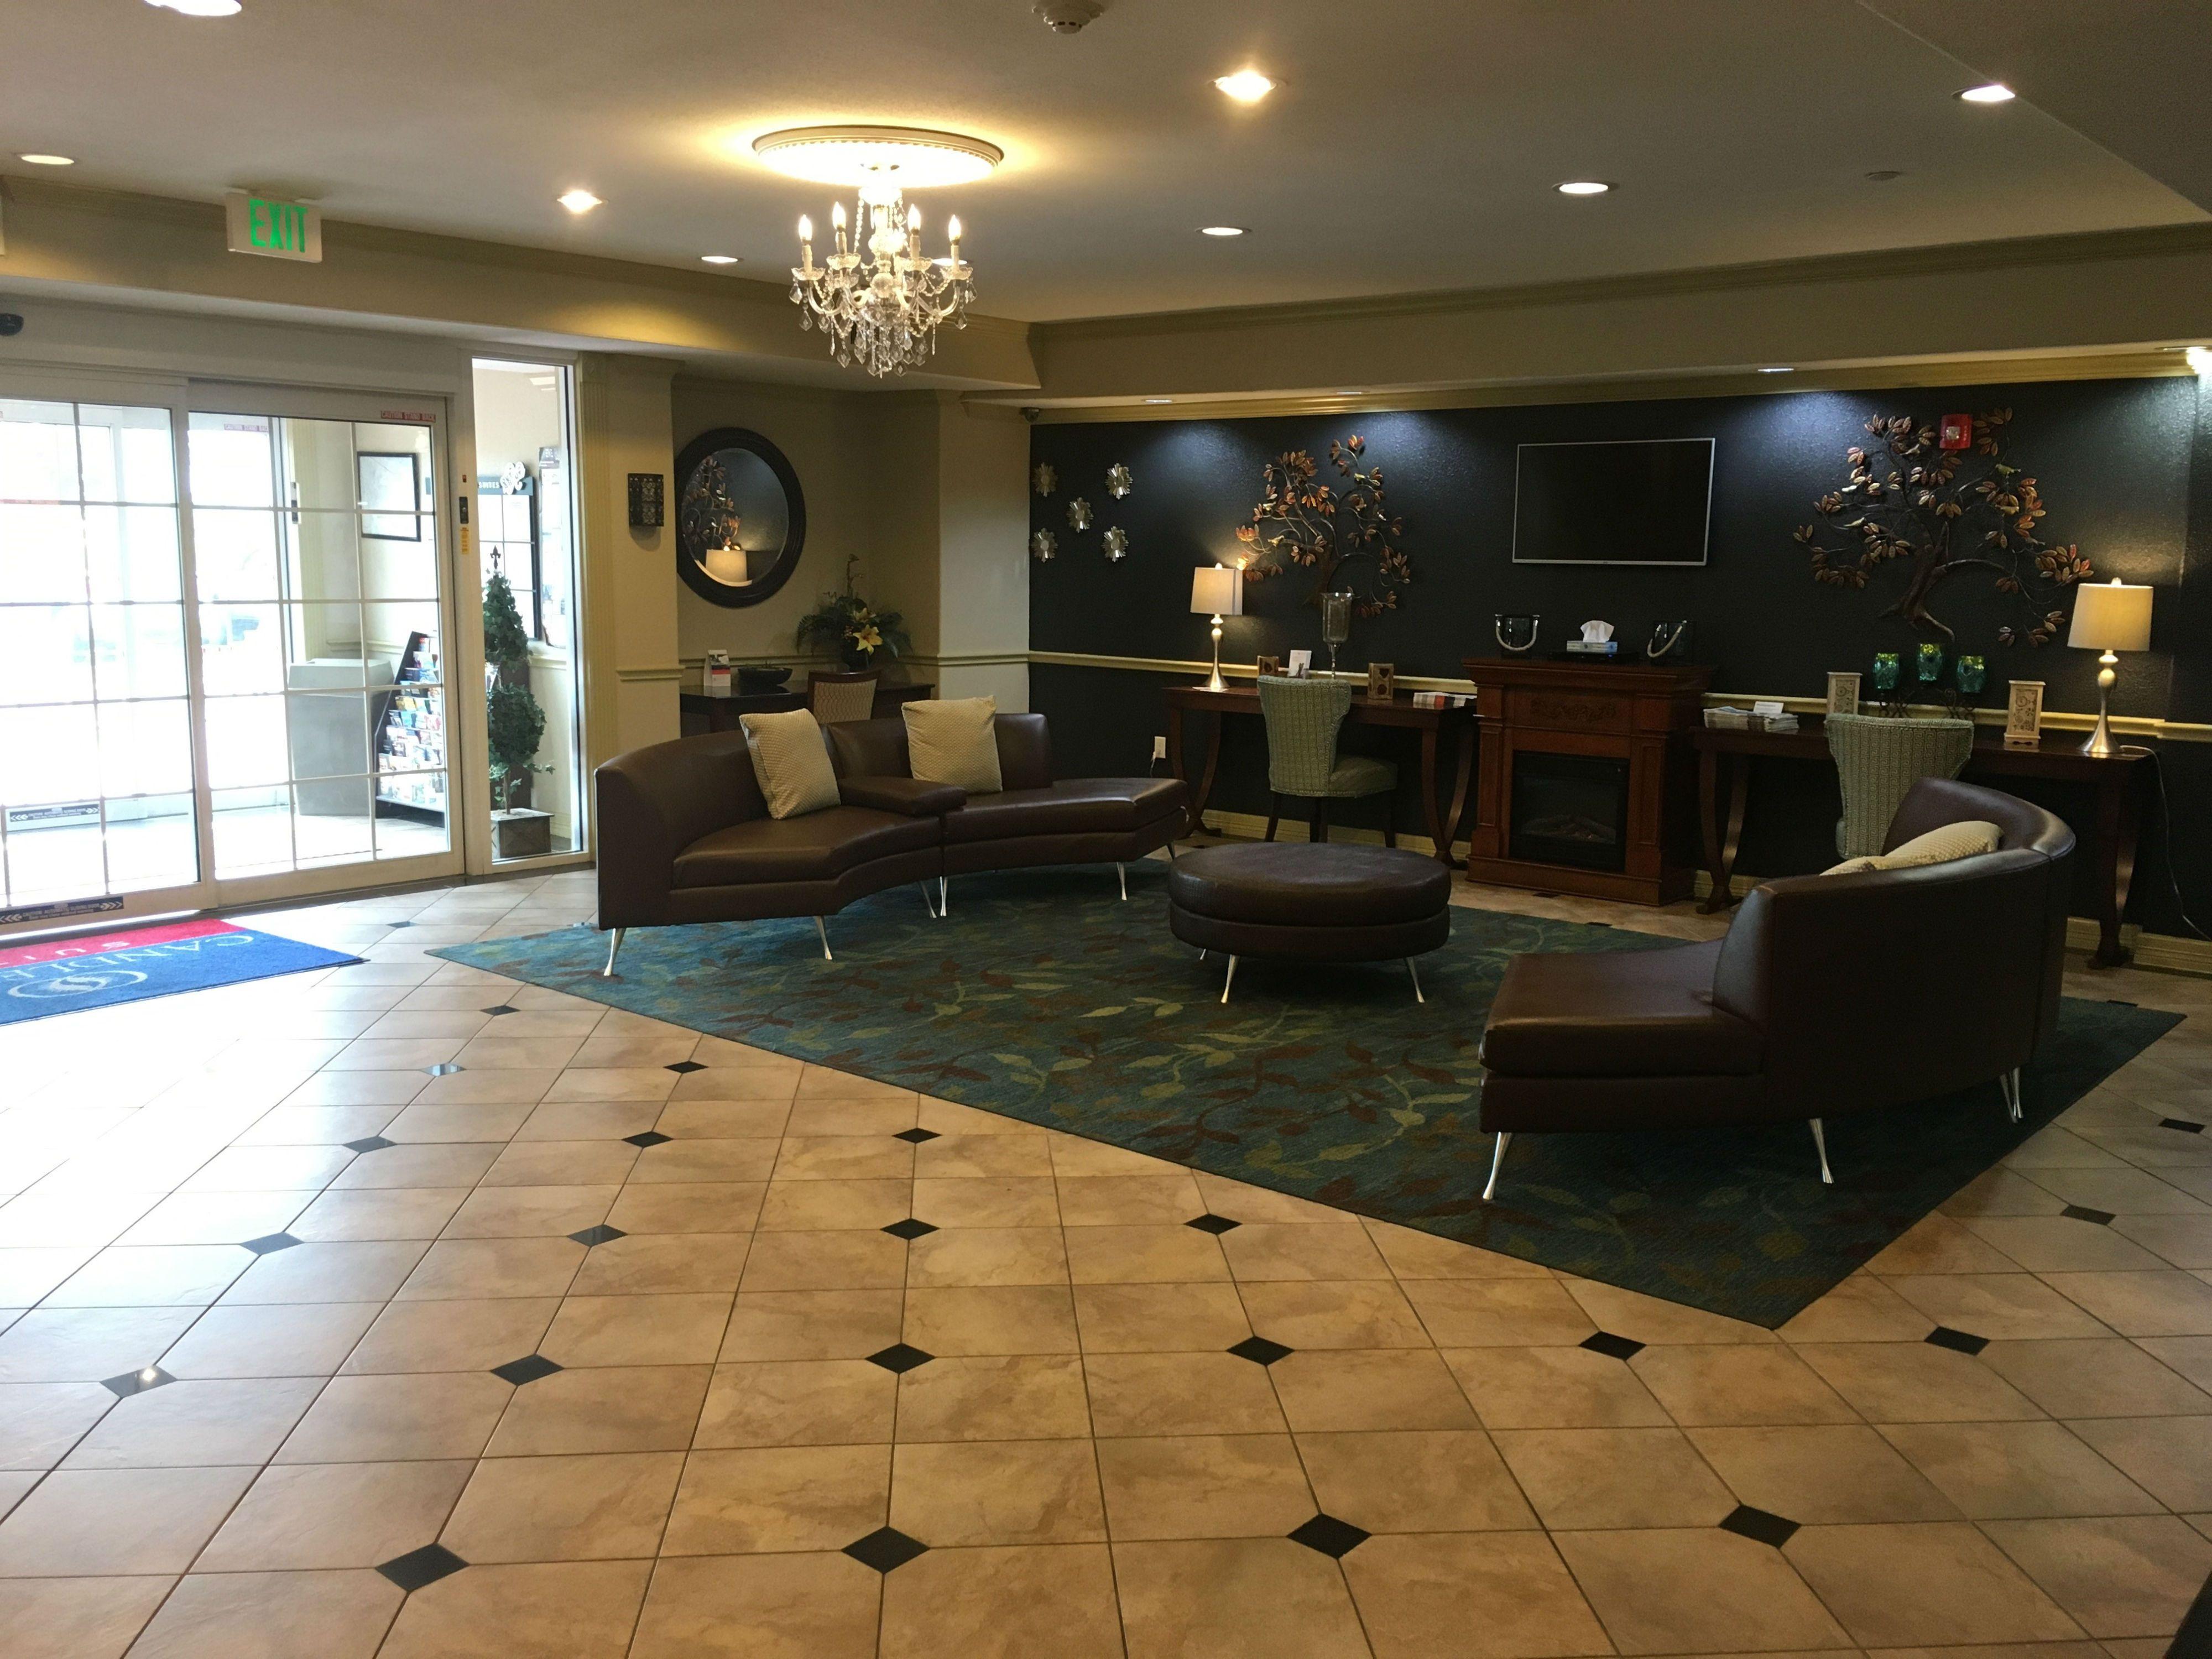 Hotels motels in la porte tx la porte texas hotels for Quality inn la porte tx